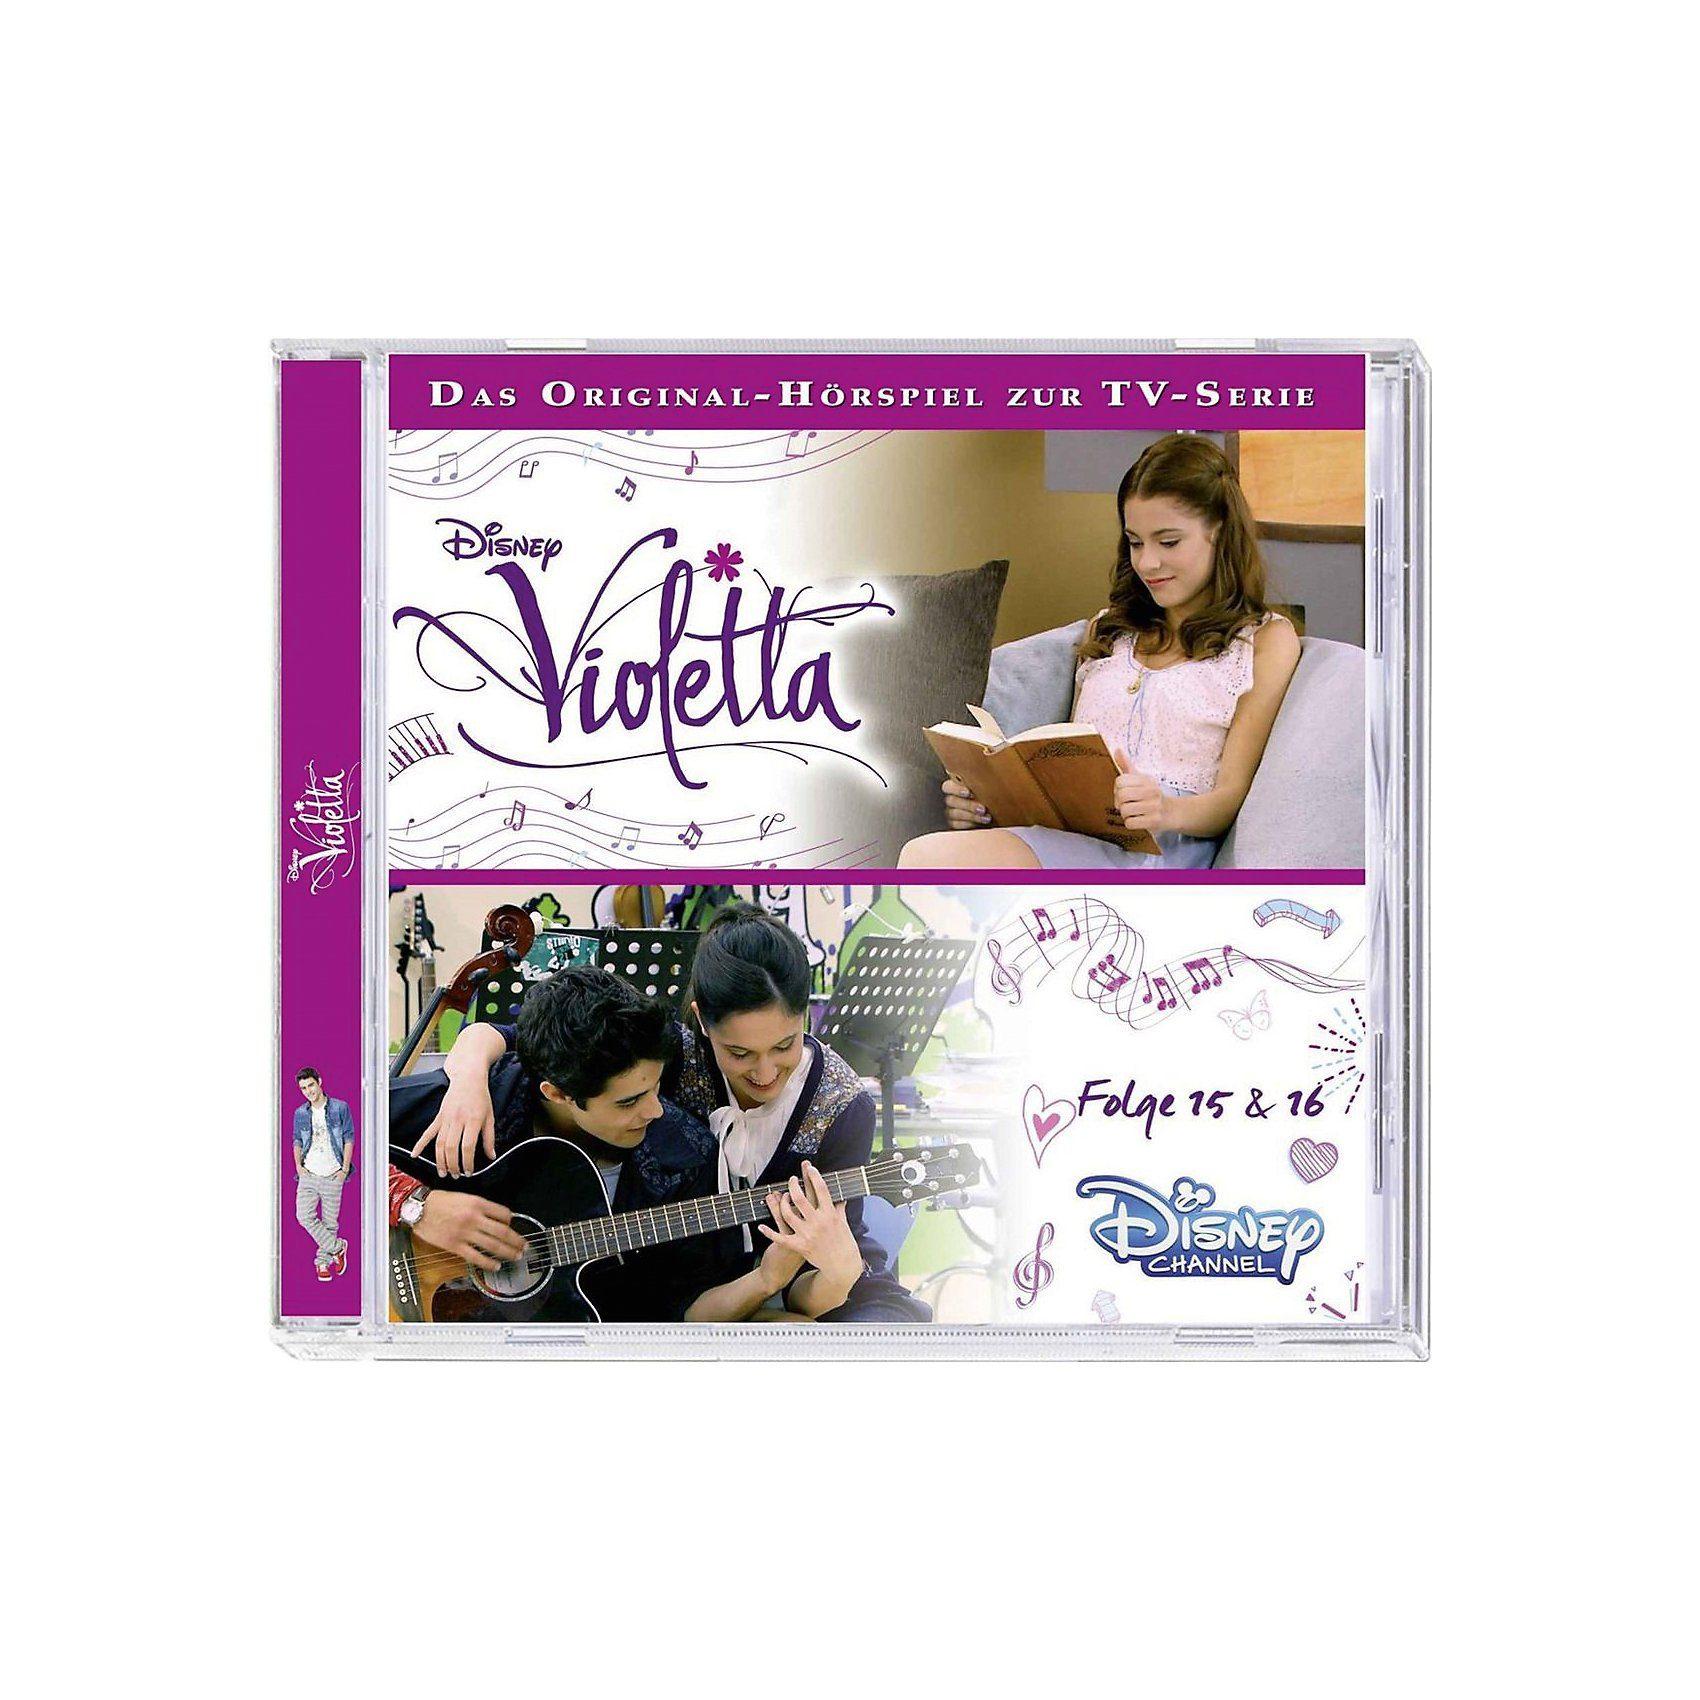 Kiddinx CD Disney Violetta 08 (Folge 15+16)